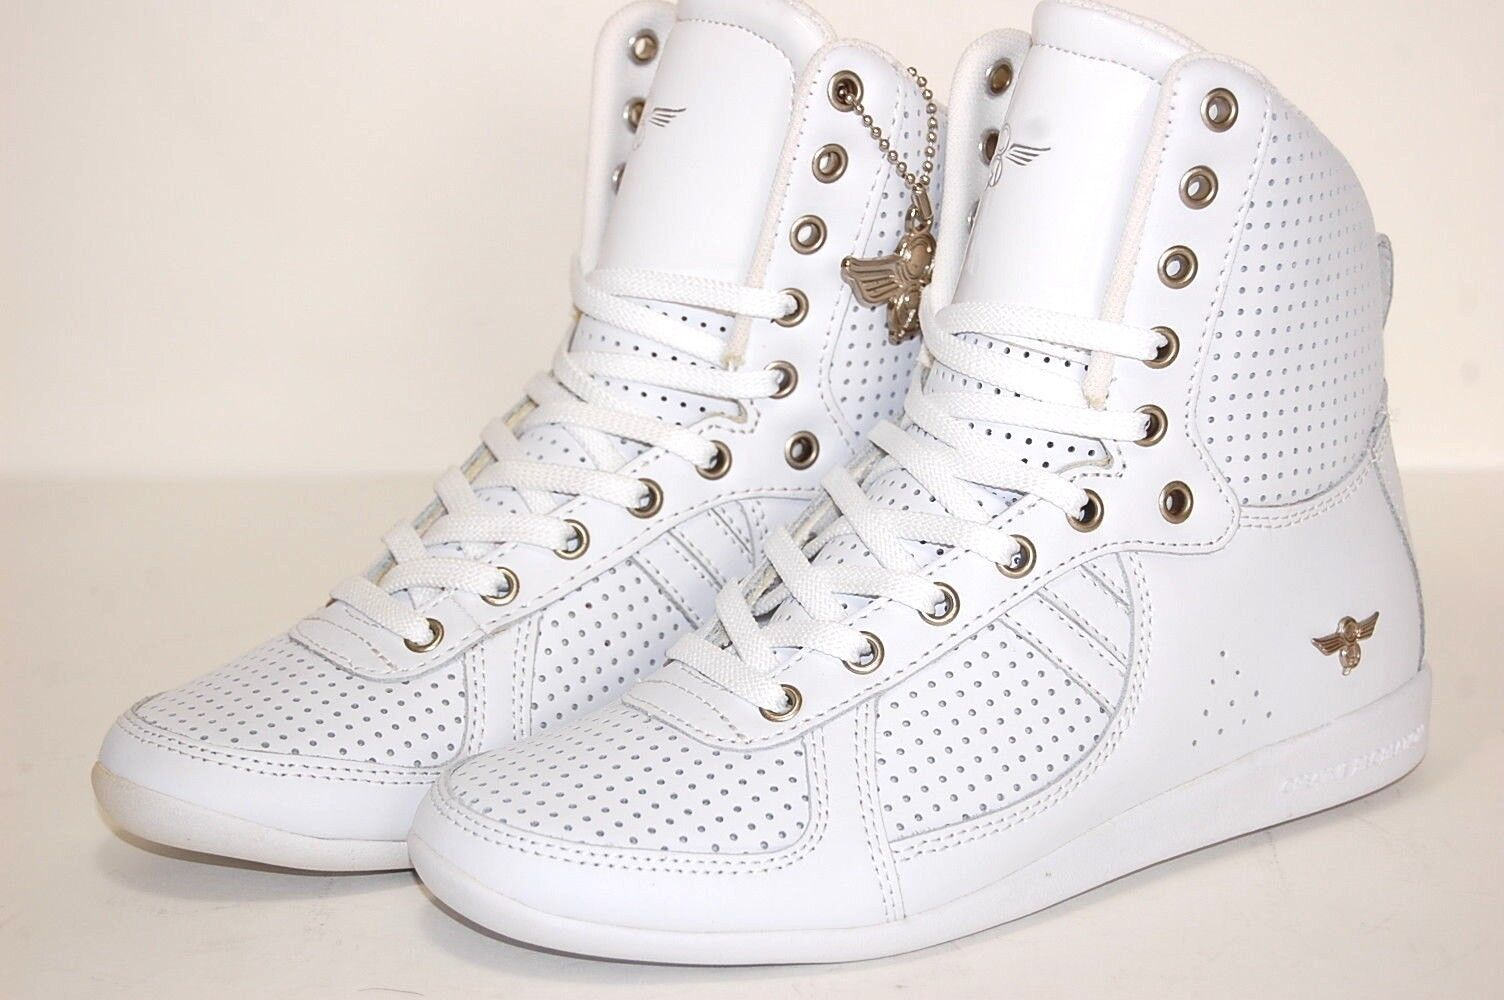 Creative Recreation WCR75HI18 W Gallo Hi White Women shoes